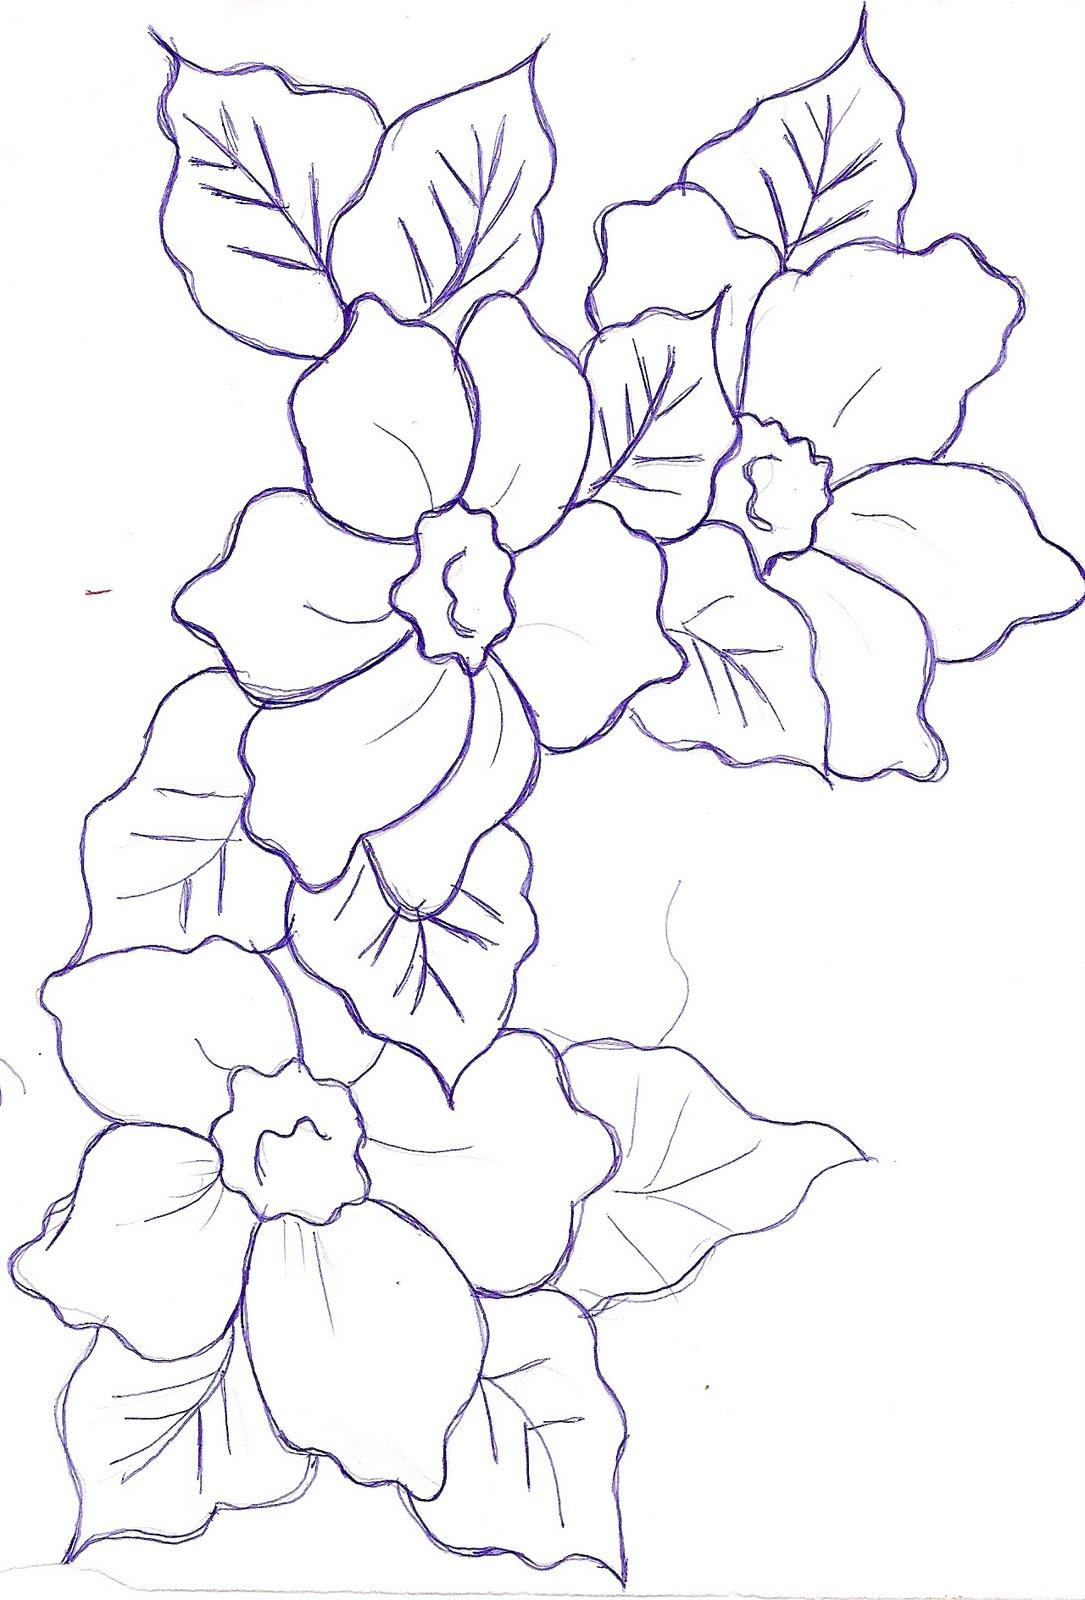 Dibujos De Flores Faciles. Excellent Dibujos De Flores Para Pintar ...